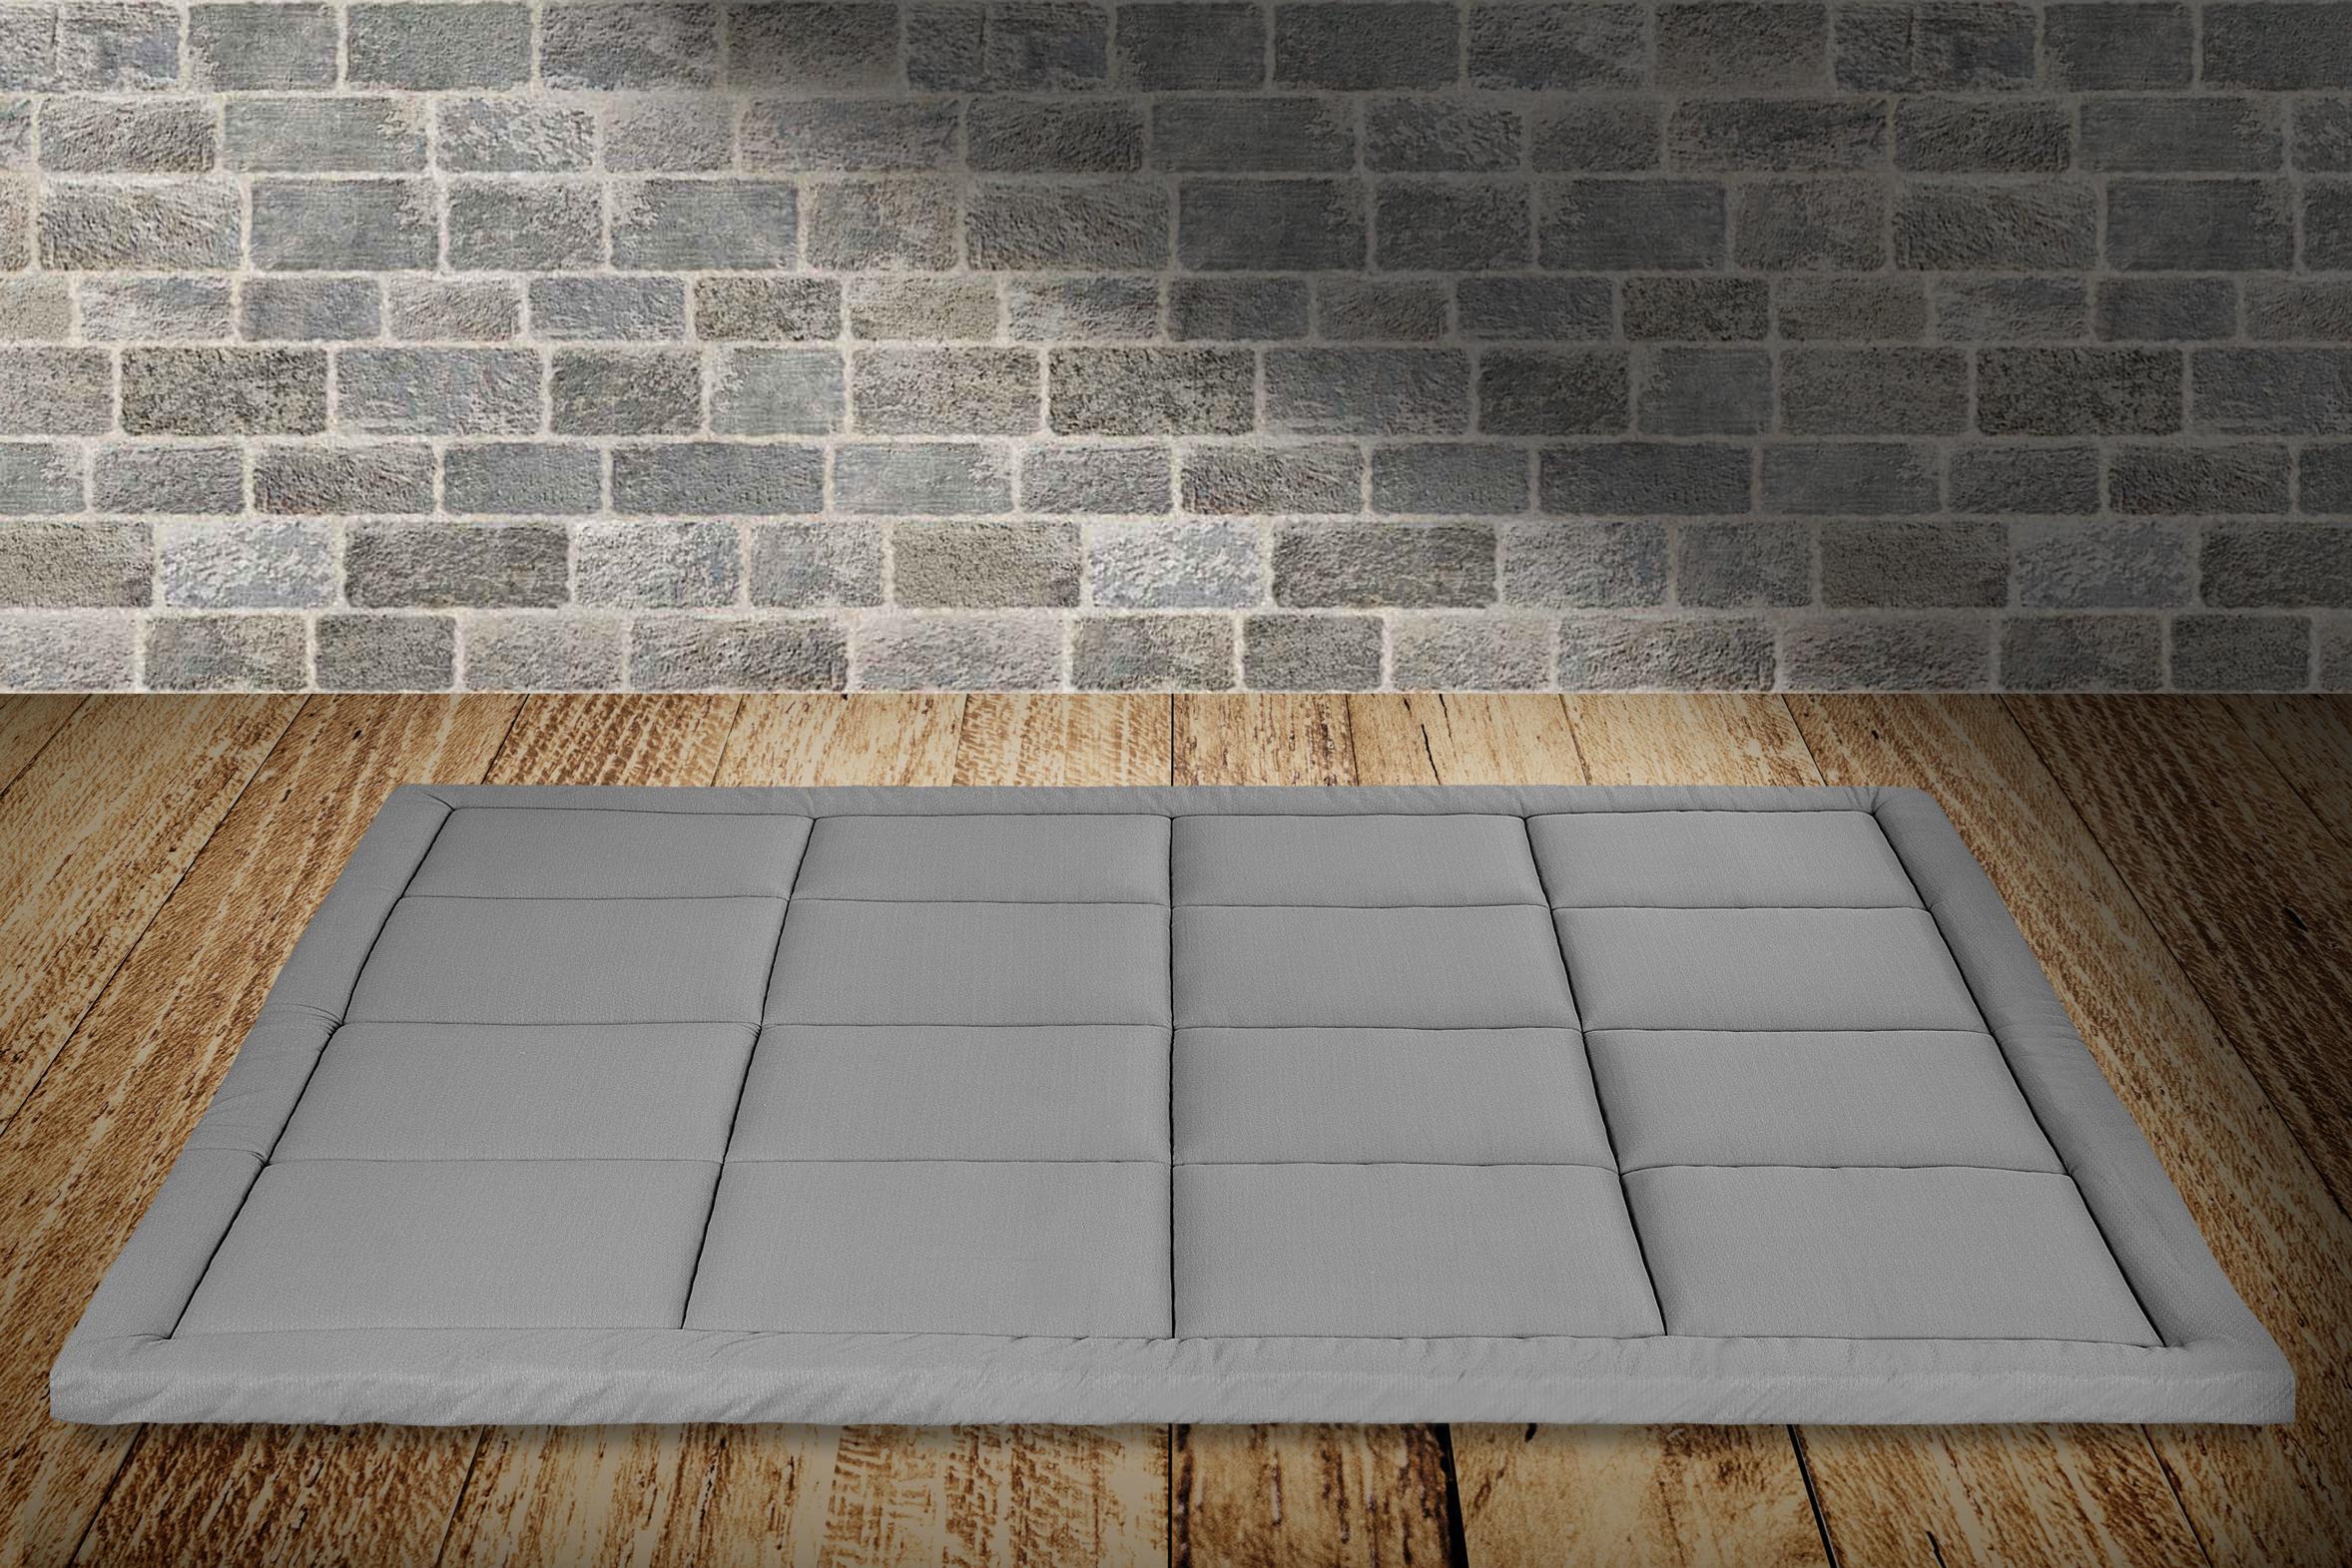 materasso da pavimento zn18 regardsdefemmes. Black Bedroom Furniture Sets. Home Design Ideas